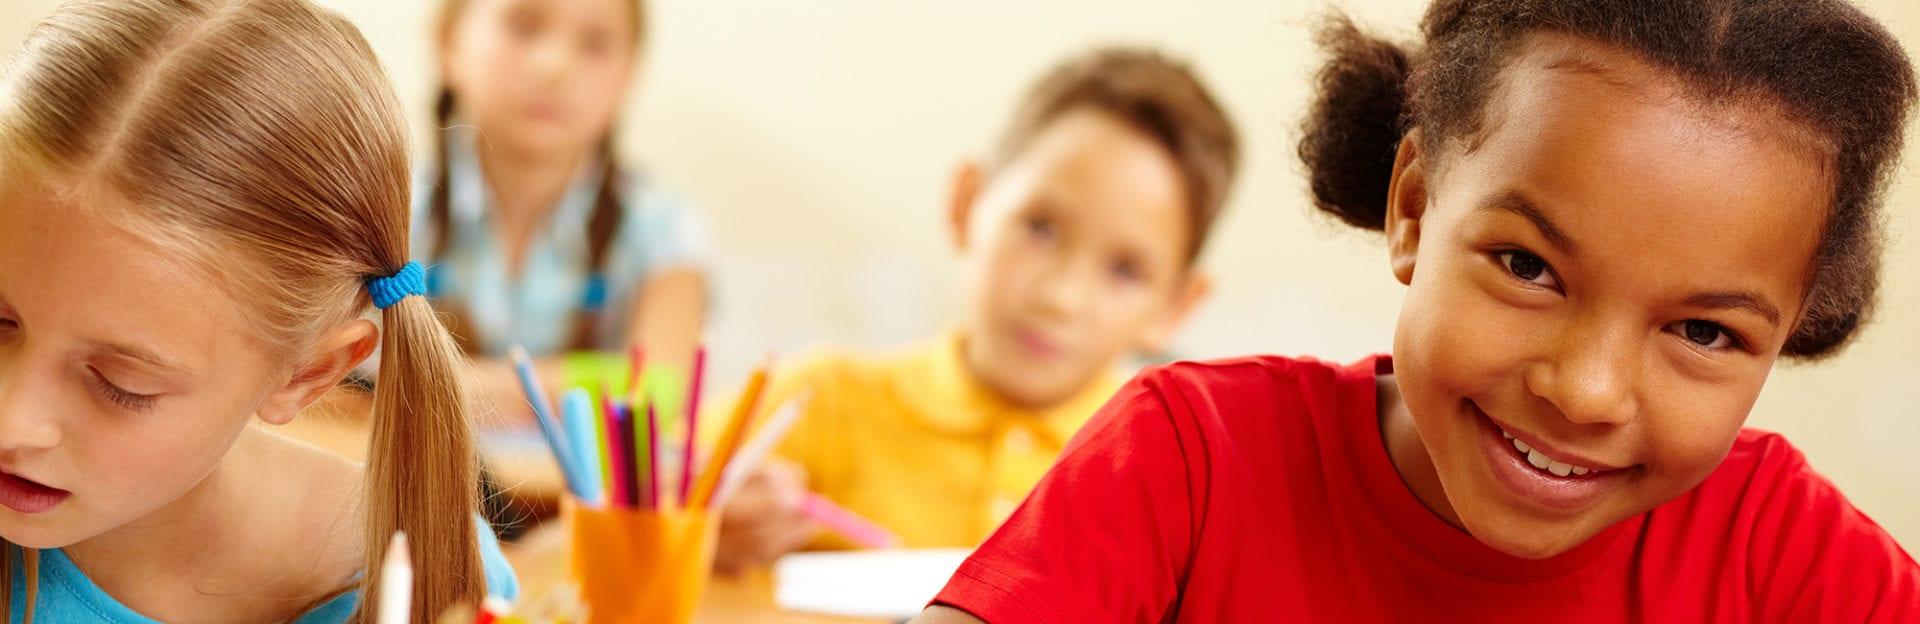 Youth Programs | The Gateway Family YMCA